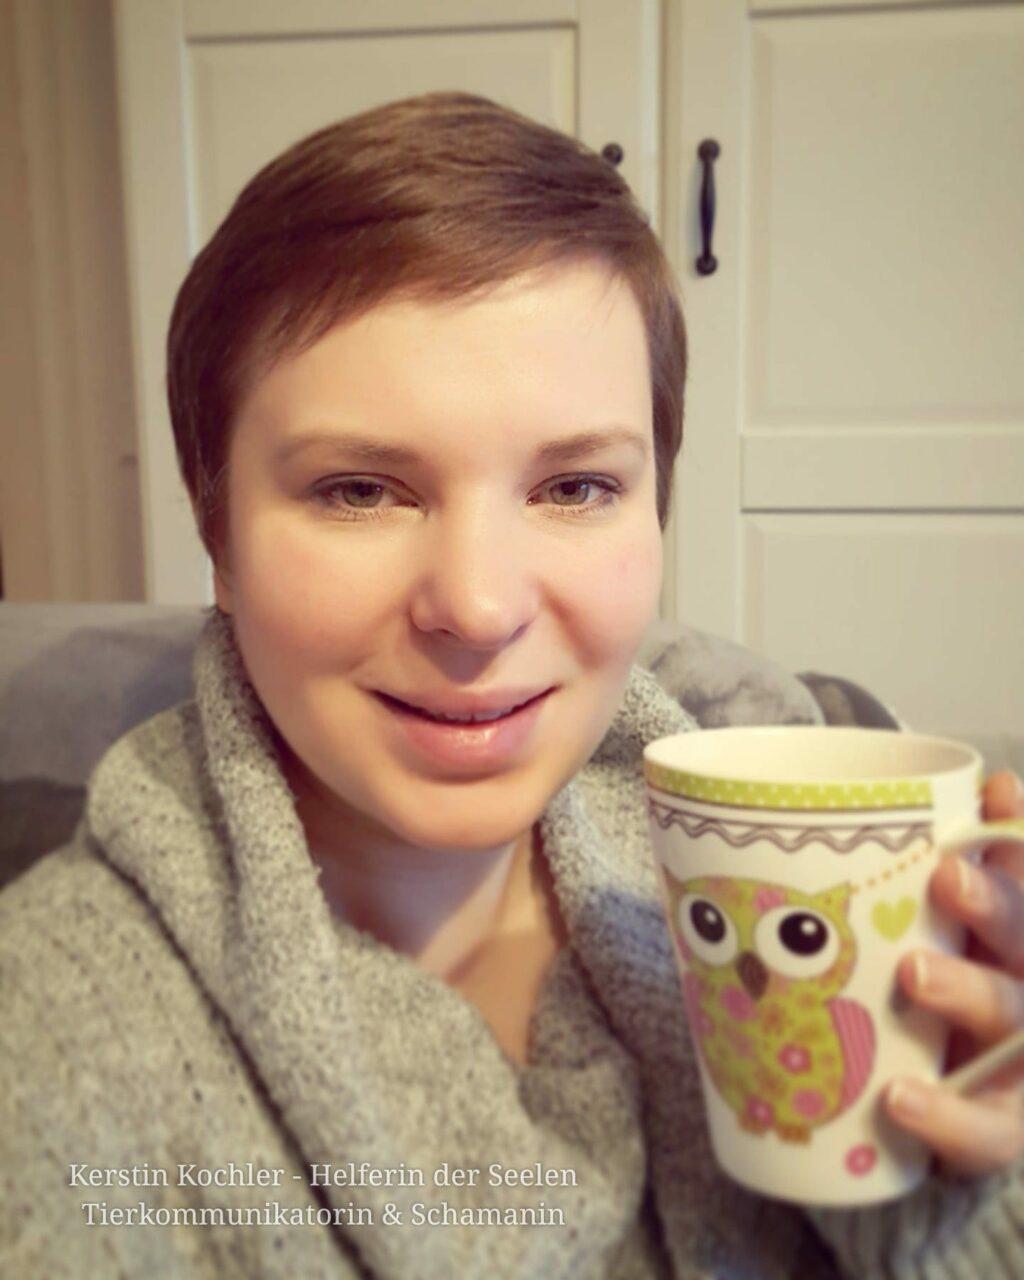 Kerstin Kochler Guten Morgen